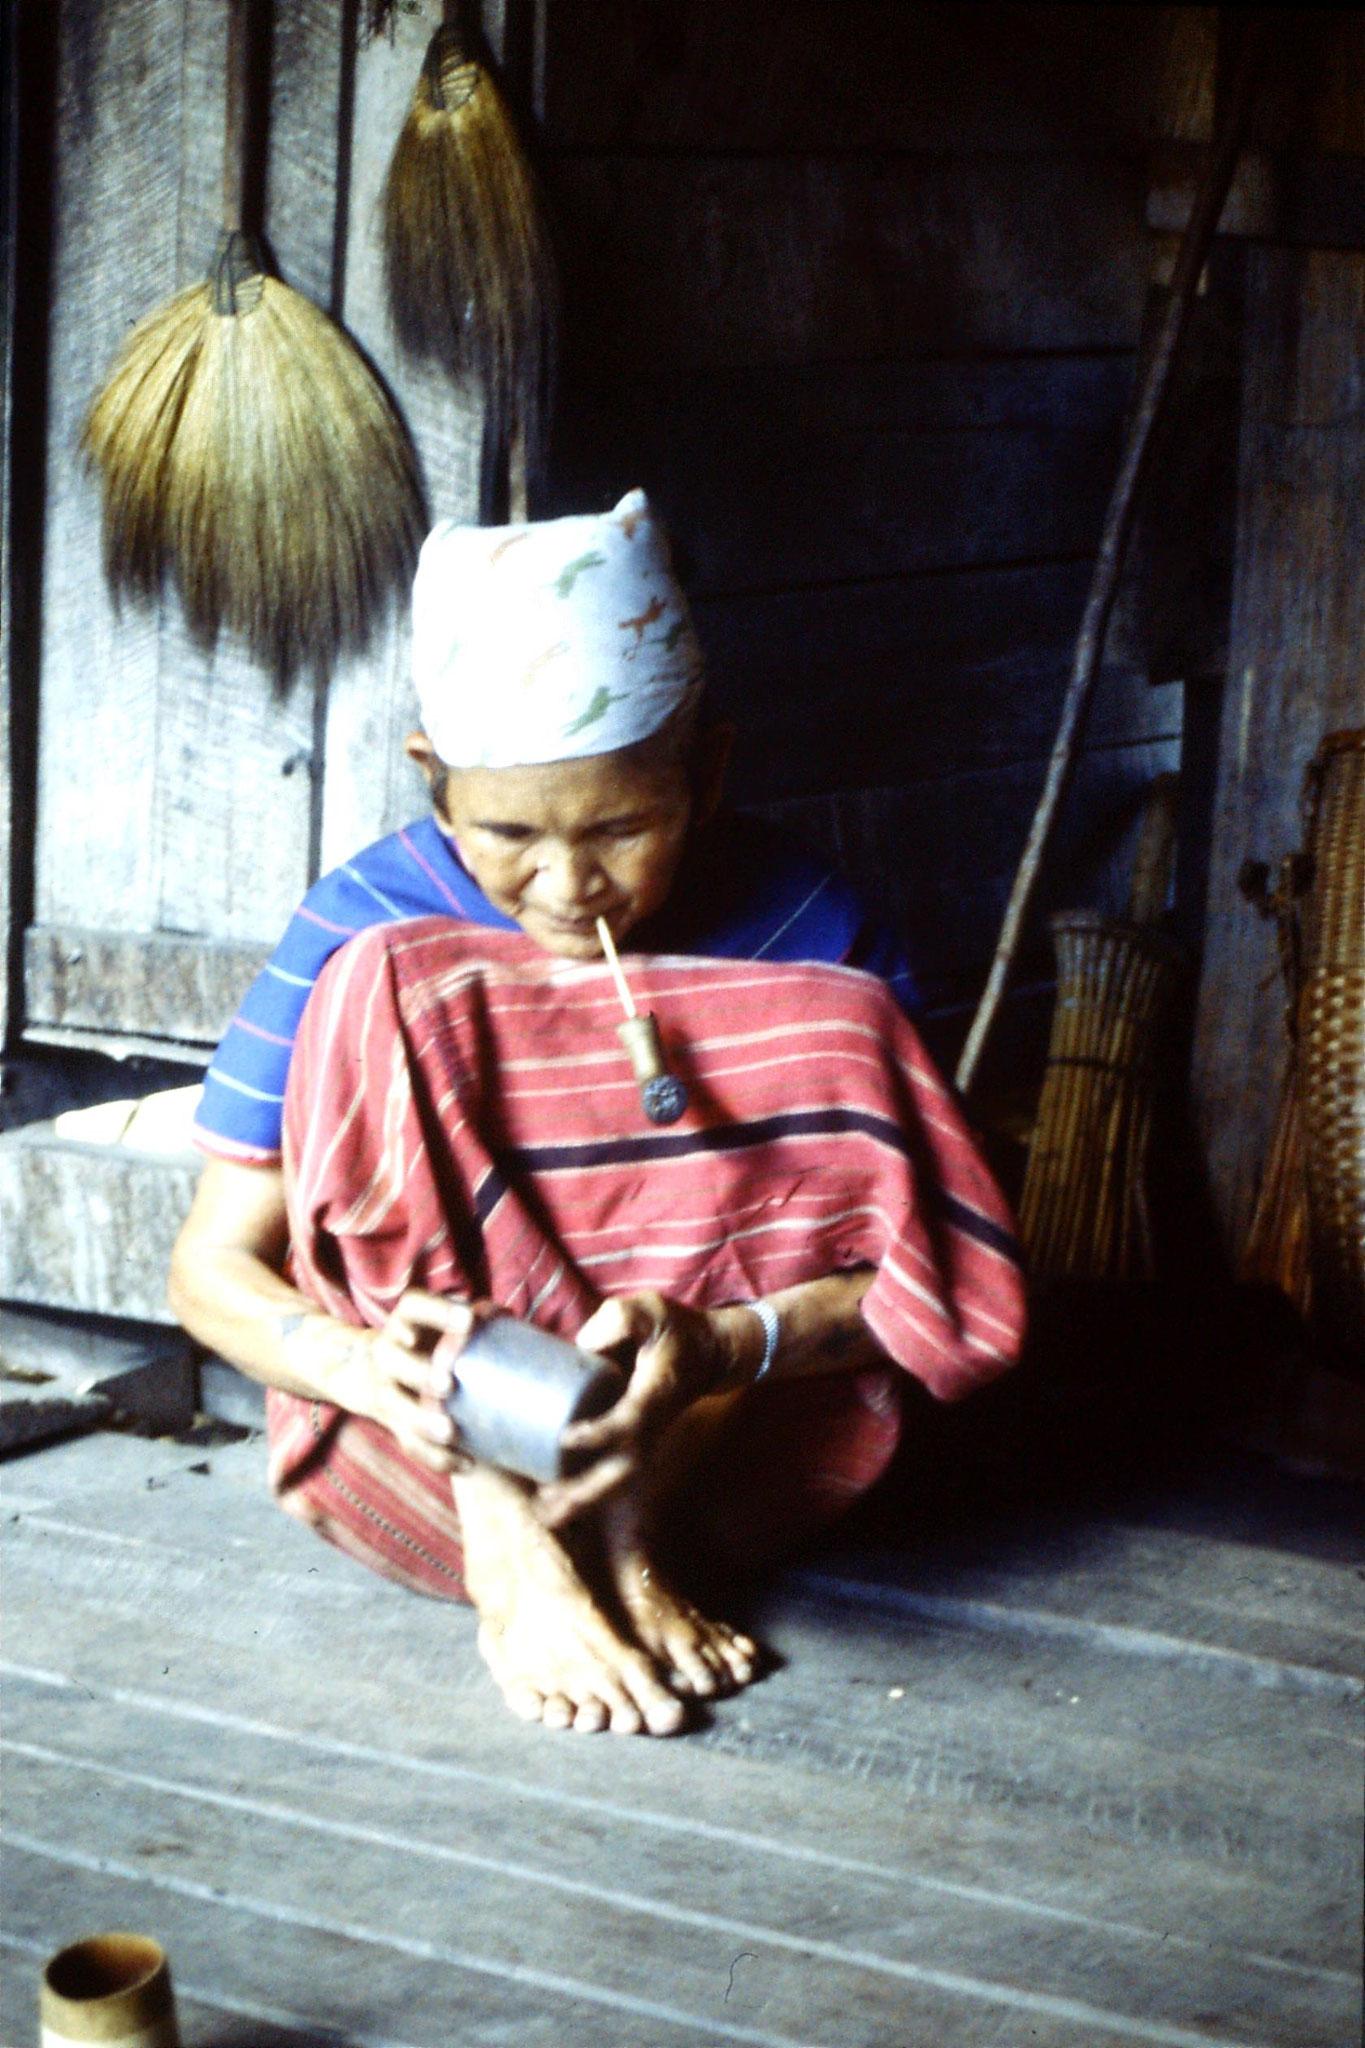 12/6/1990: 27: Trek - Hue Kom Karen village